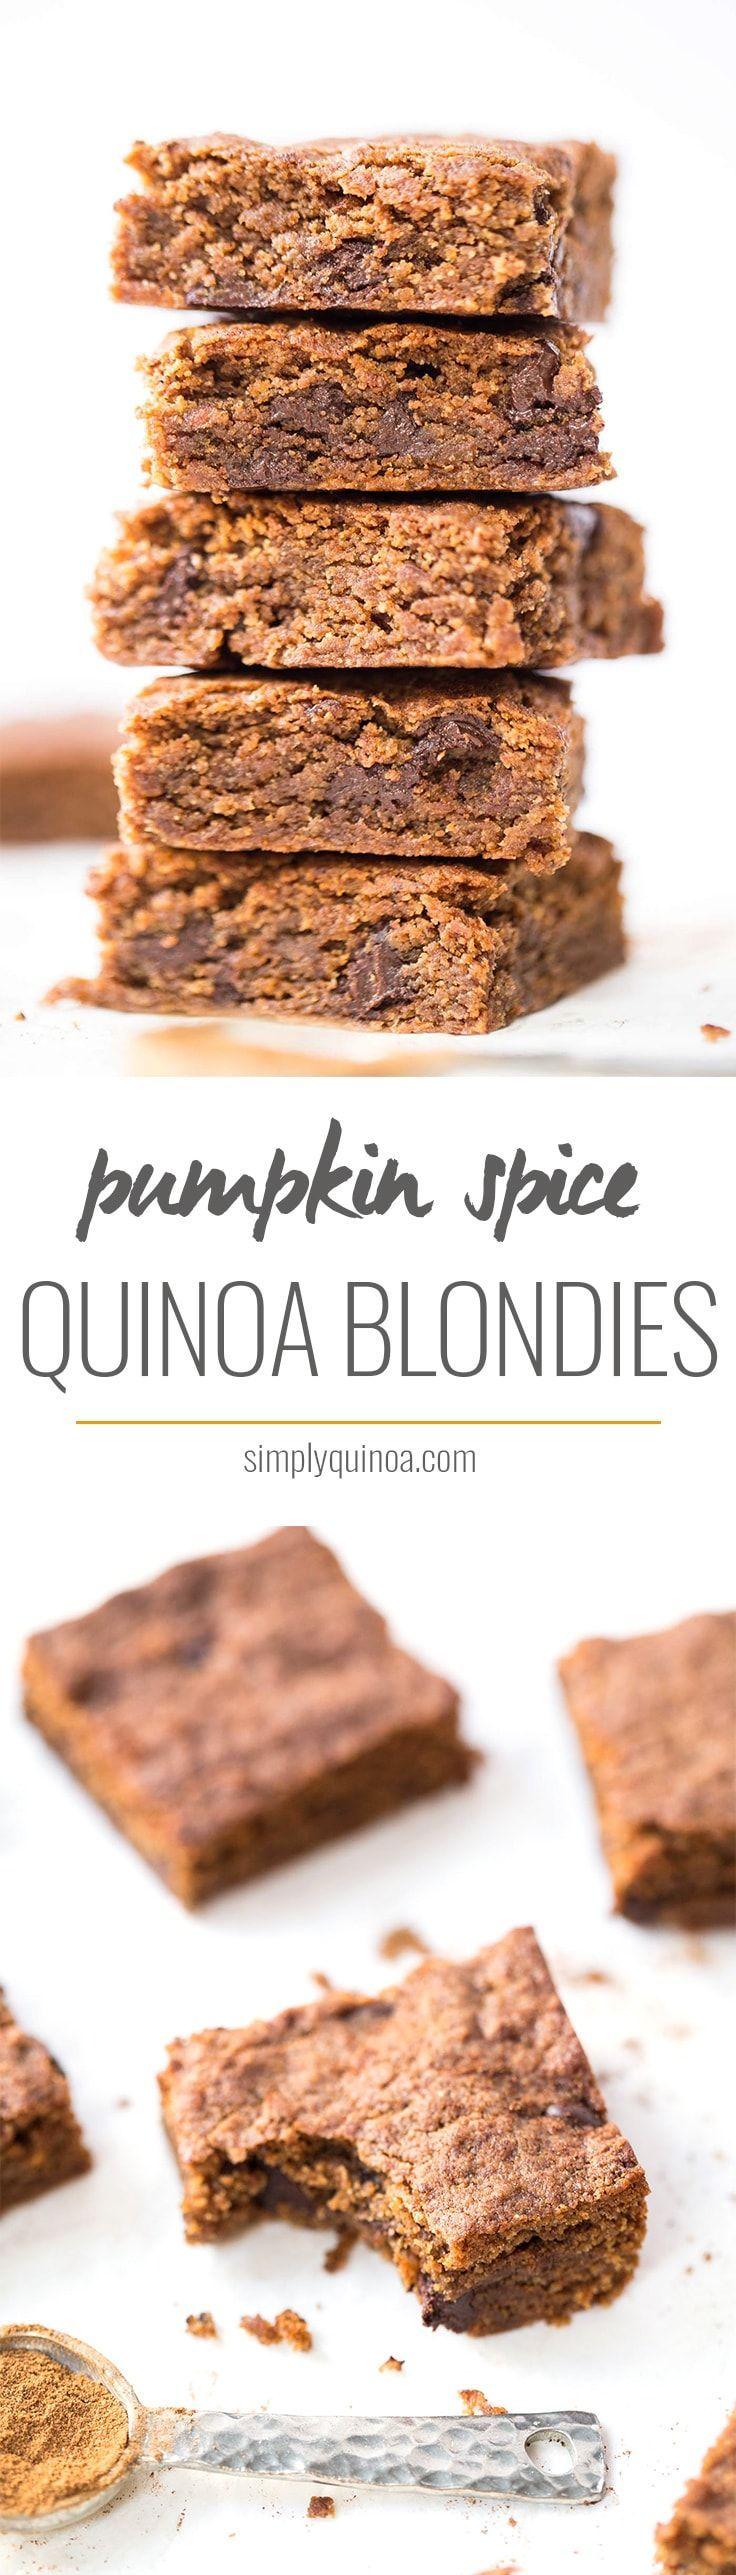 Ooey-gooey Pumpkin Spice Quinoa Blondies with dark chocolate chips! They're the perfect fall dessert!